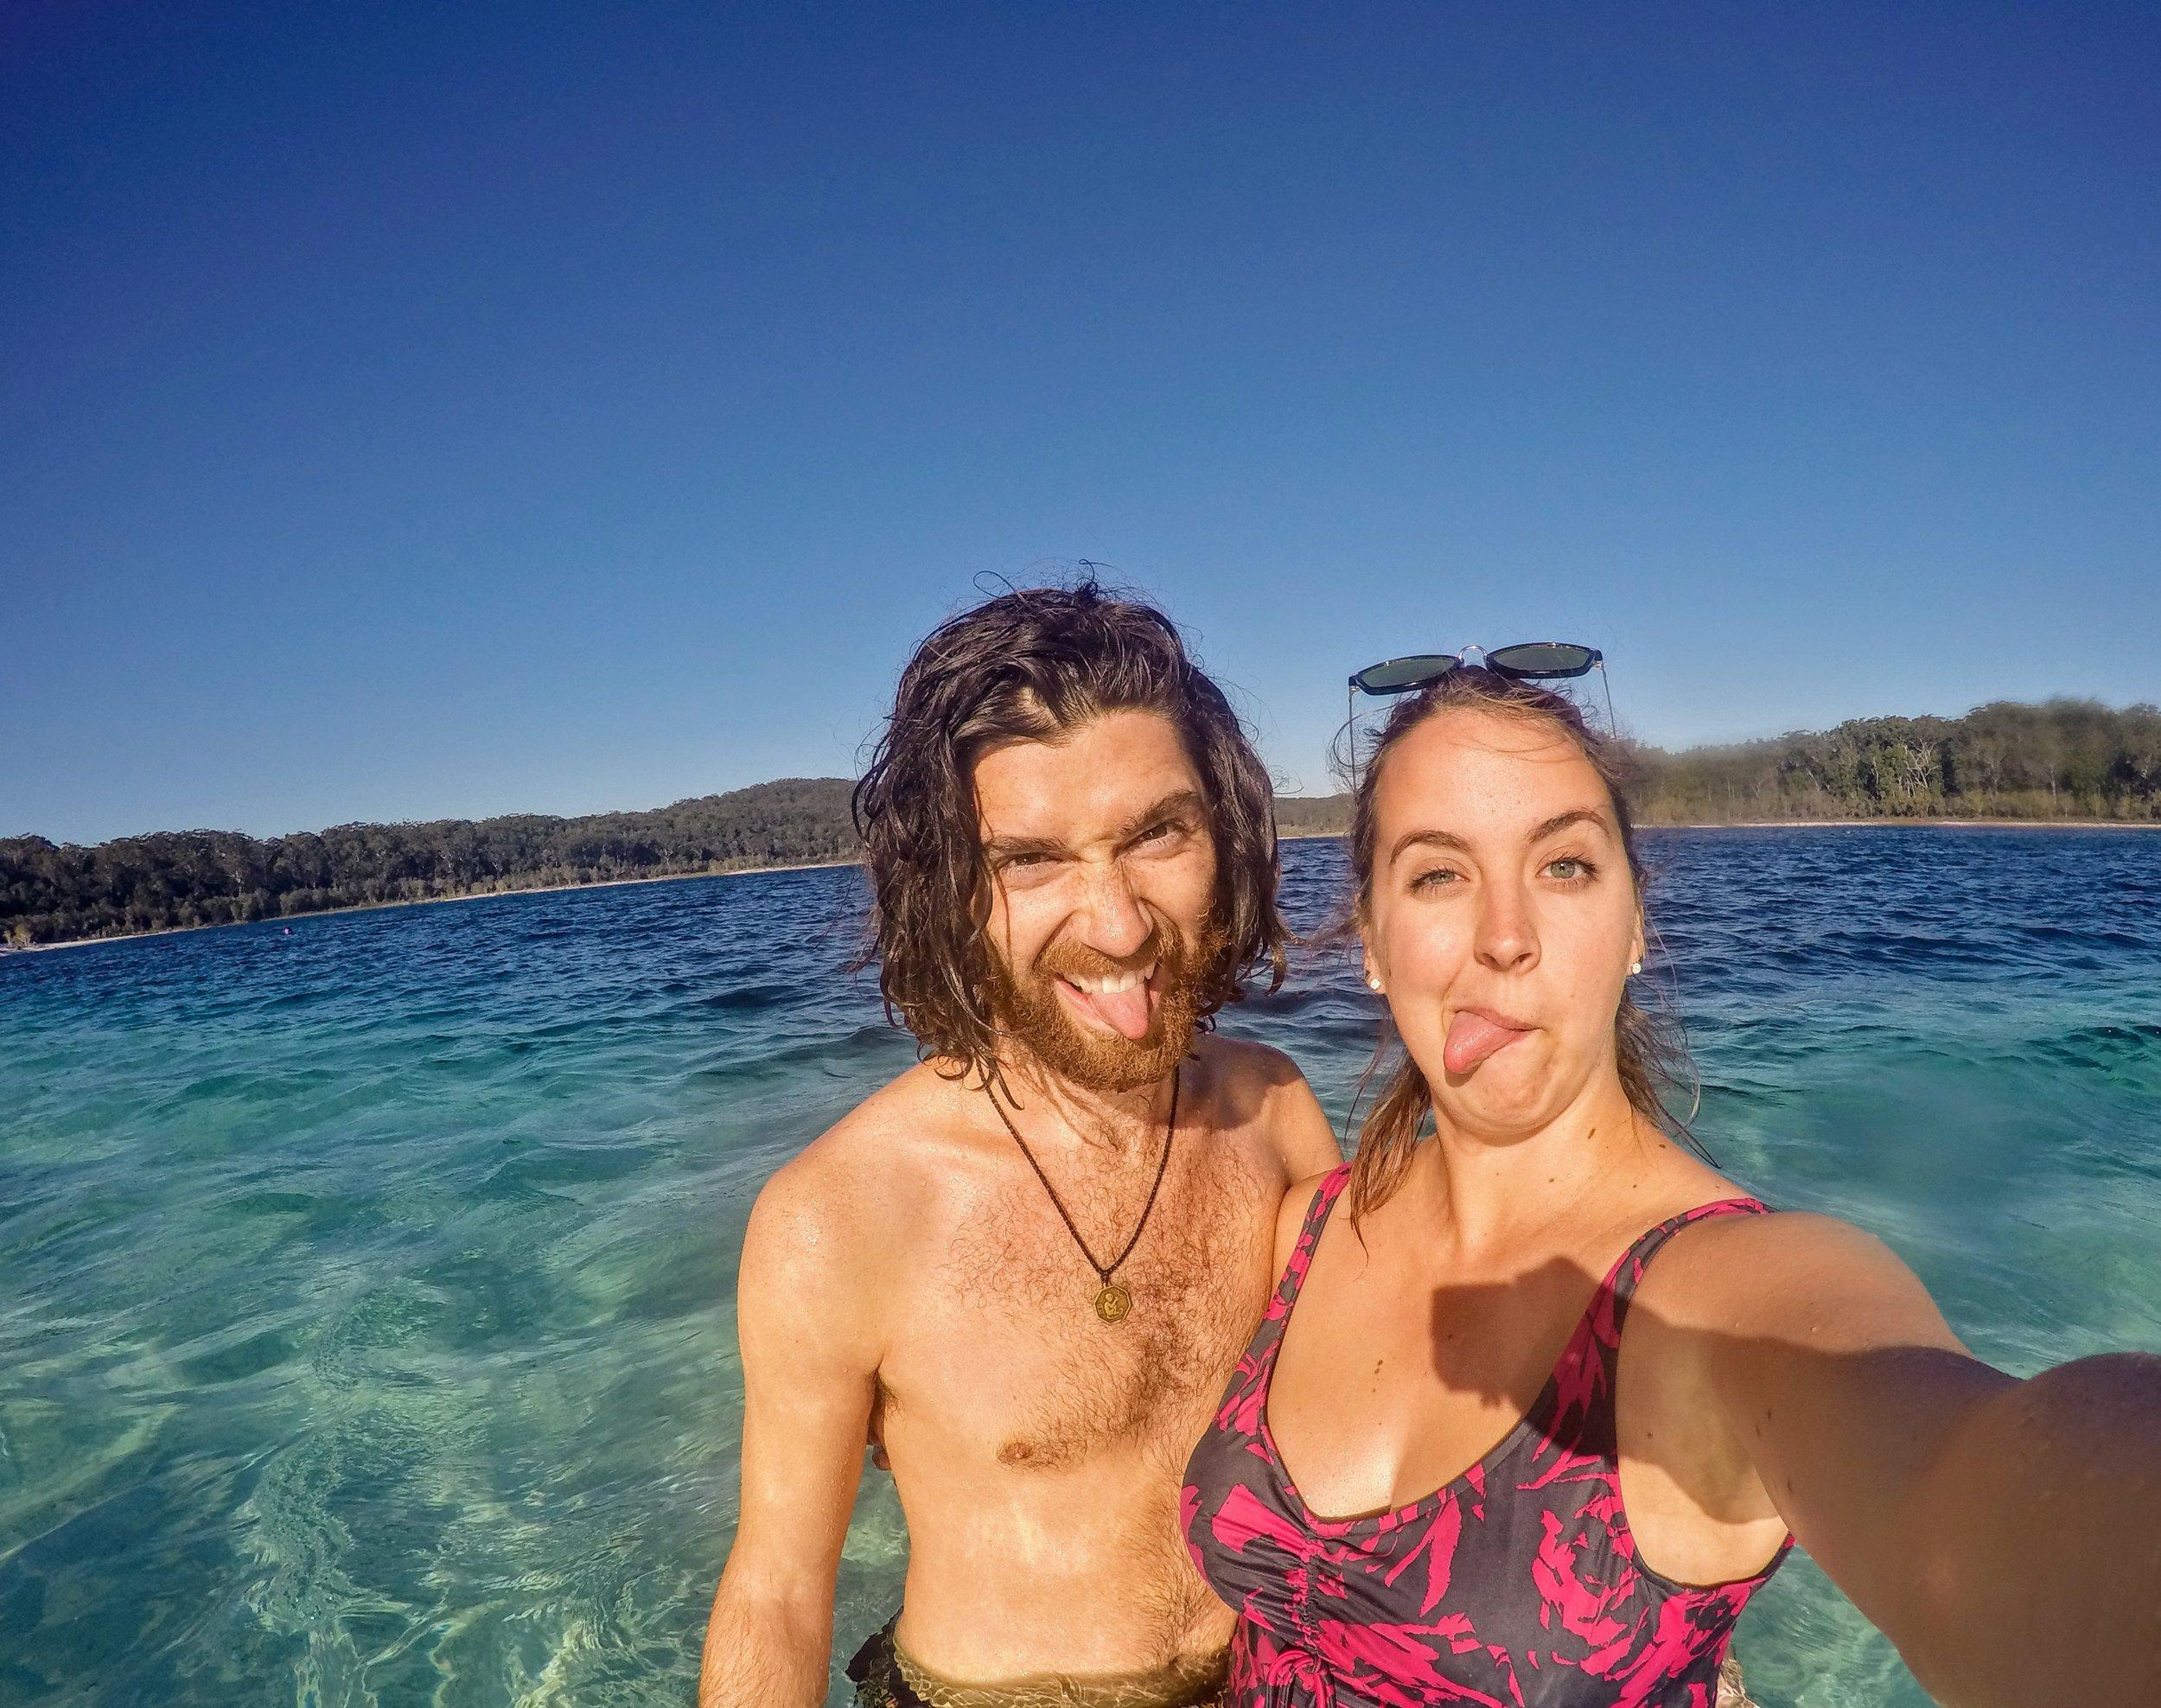 Gettin' goofy at Lake Mckenzie on Fraser Island, QLD, Australia.